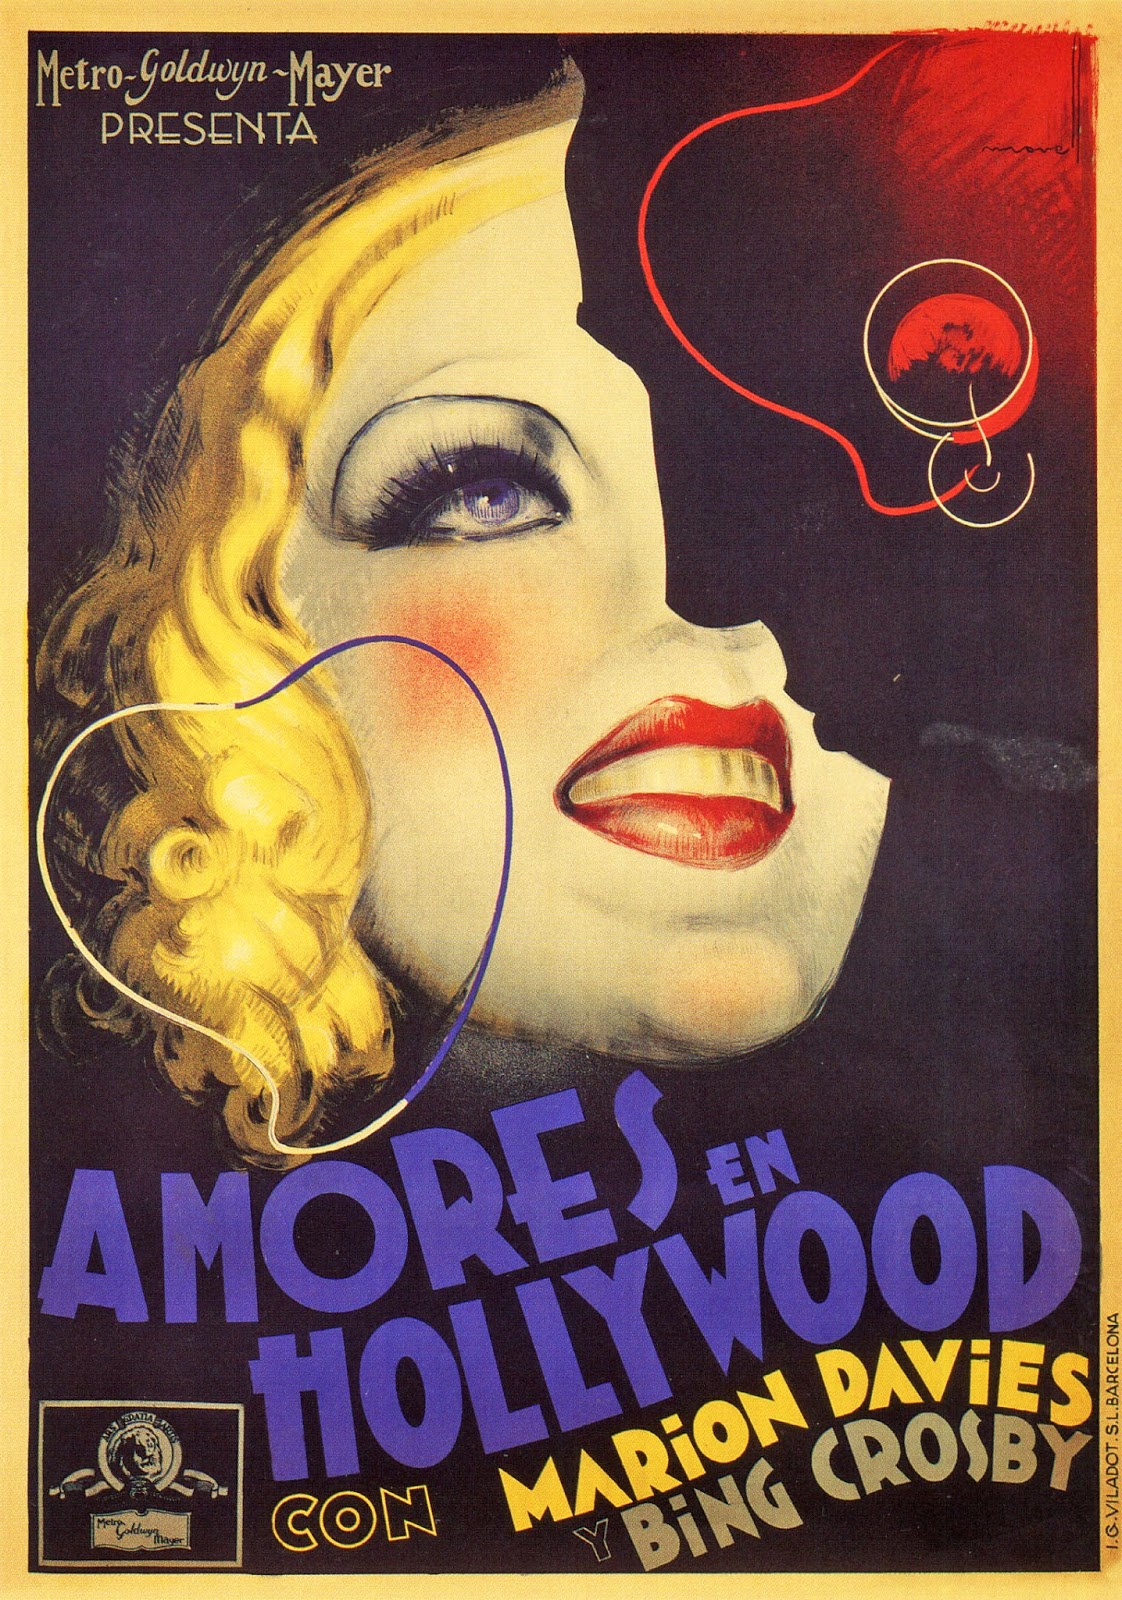 Amores en Hollywood